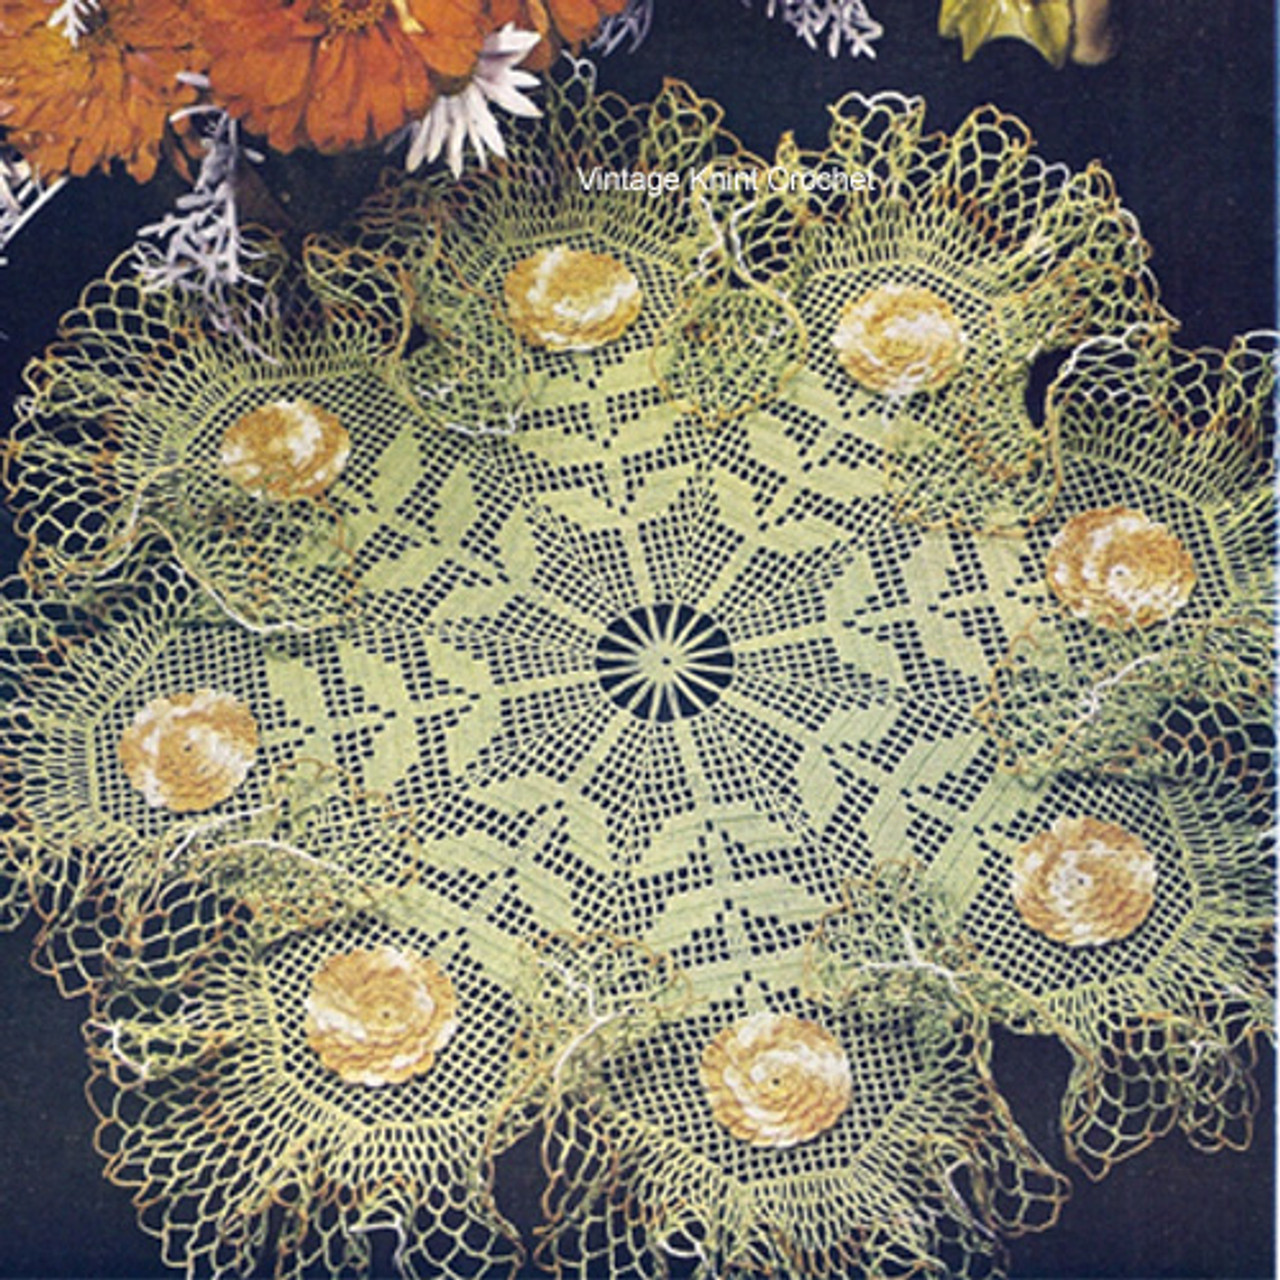 Ruffled Filet Crochet Flower Doily Pattern